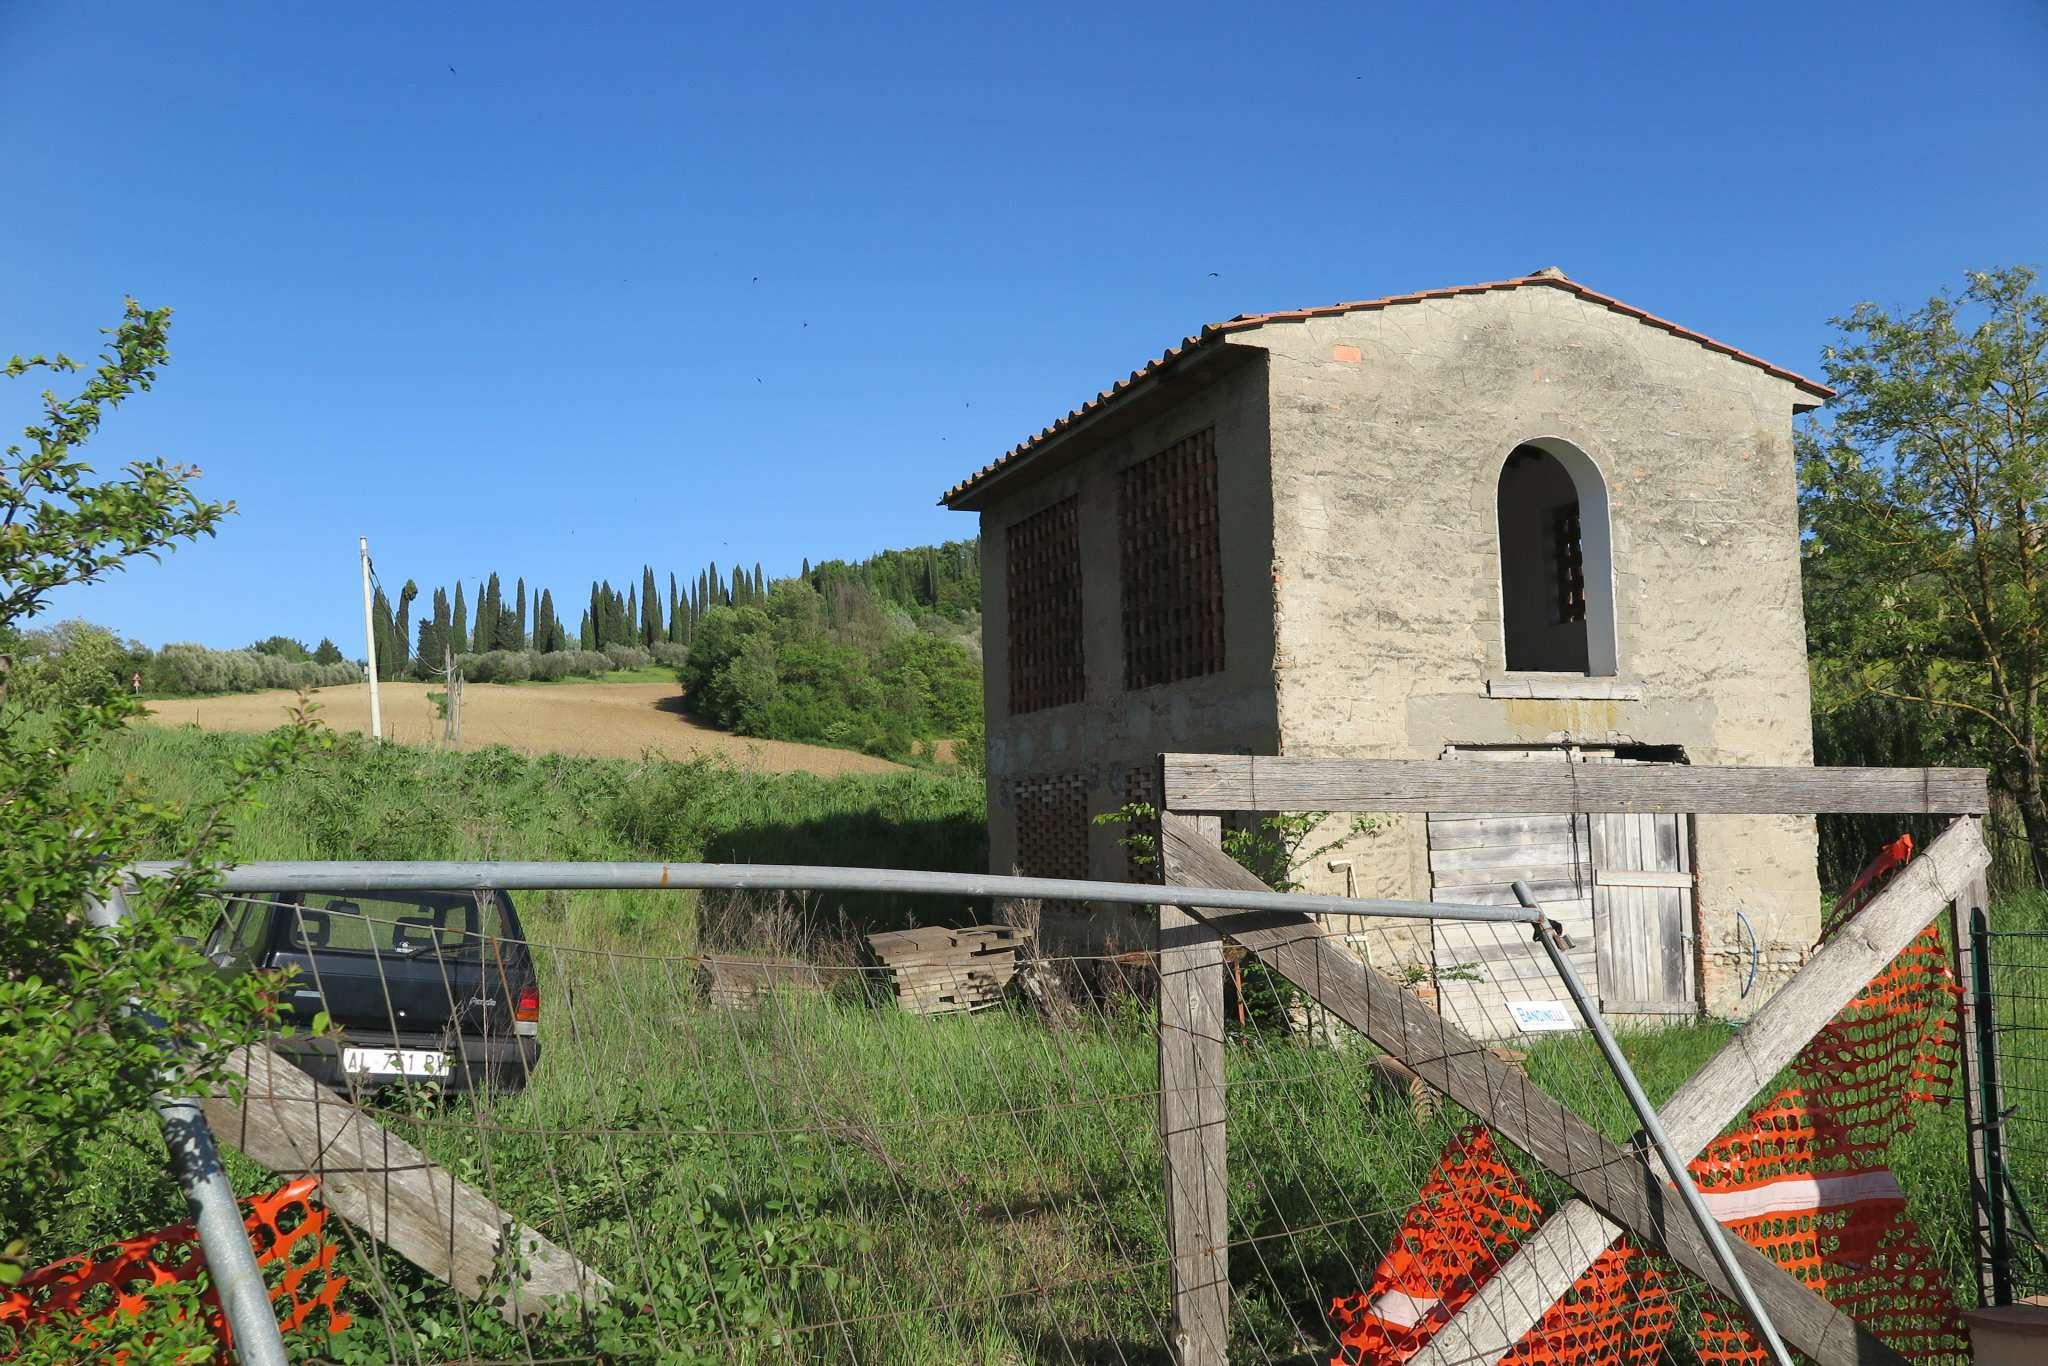 Bilocale San Casciano in Val di Pesa Via Empolese 9